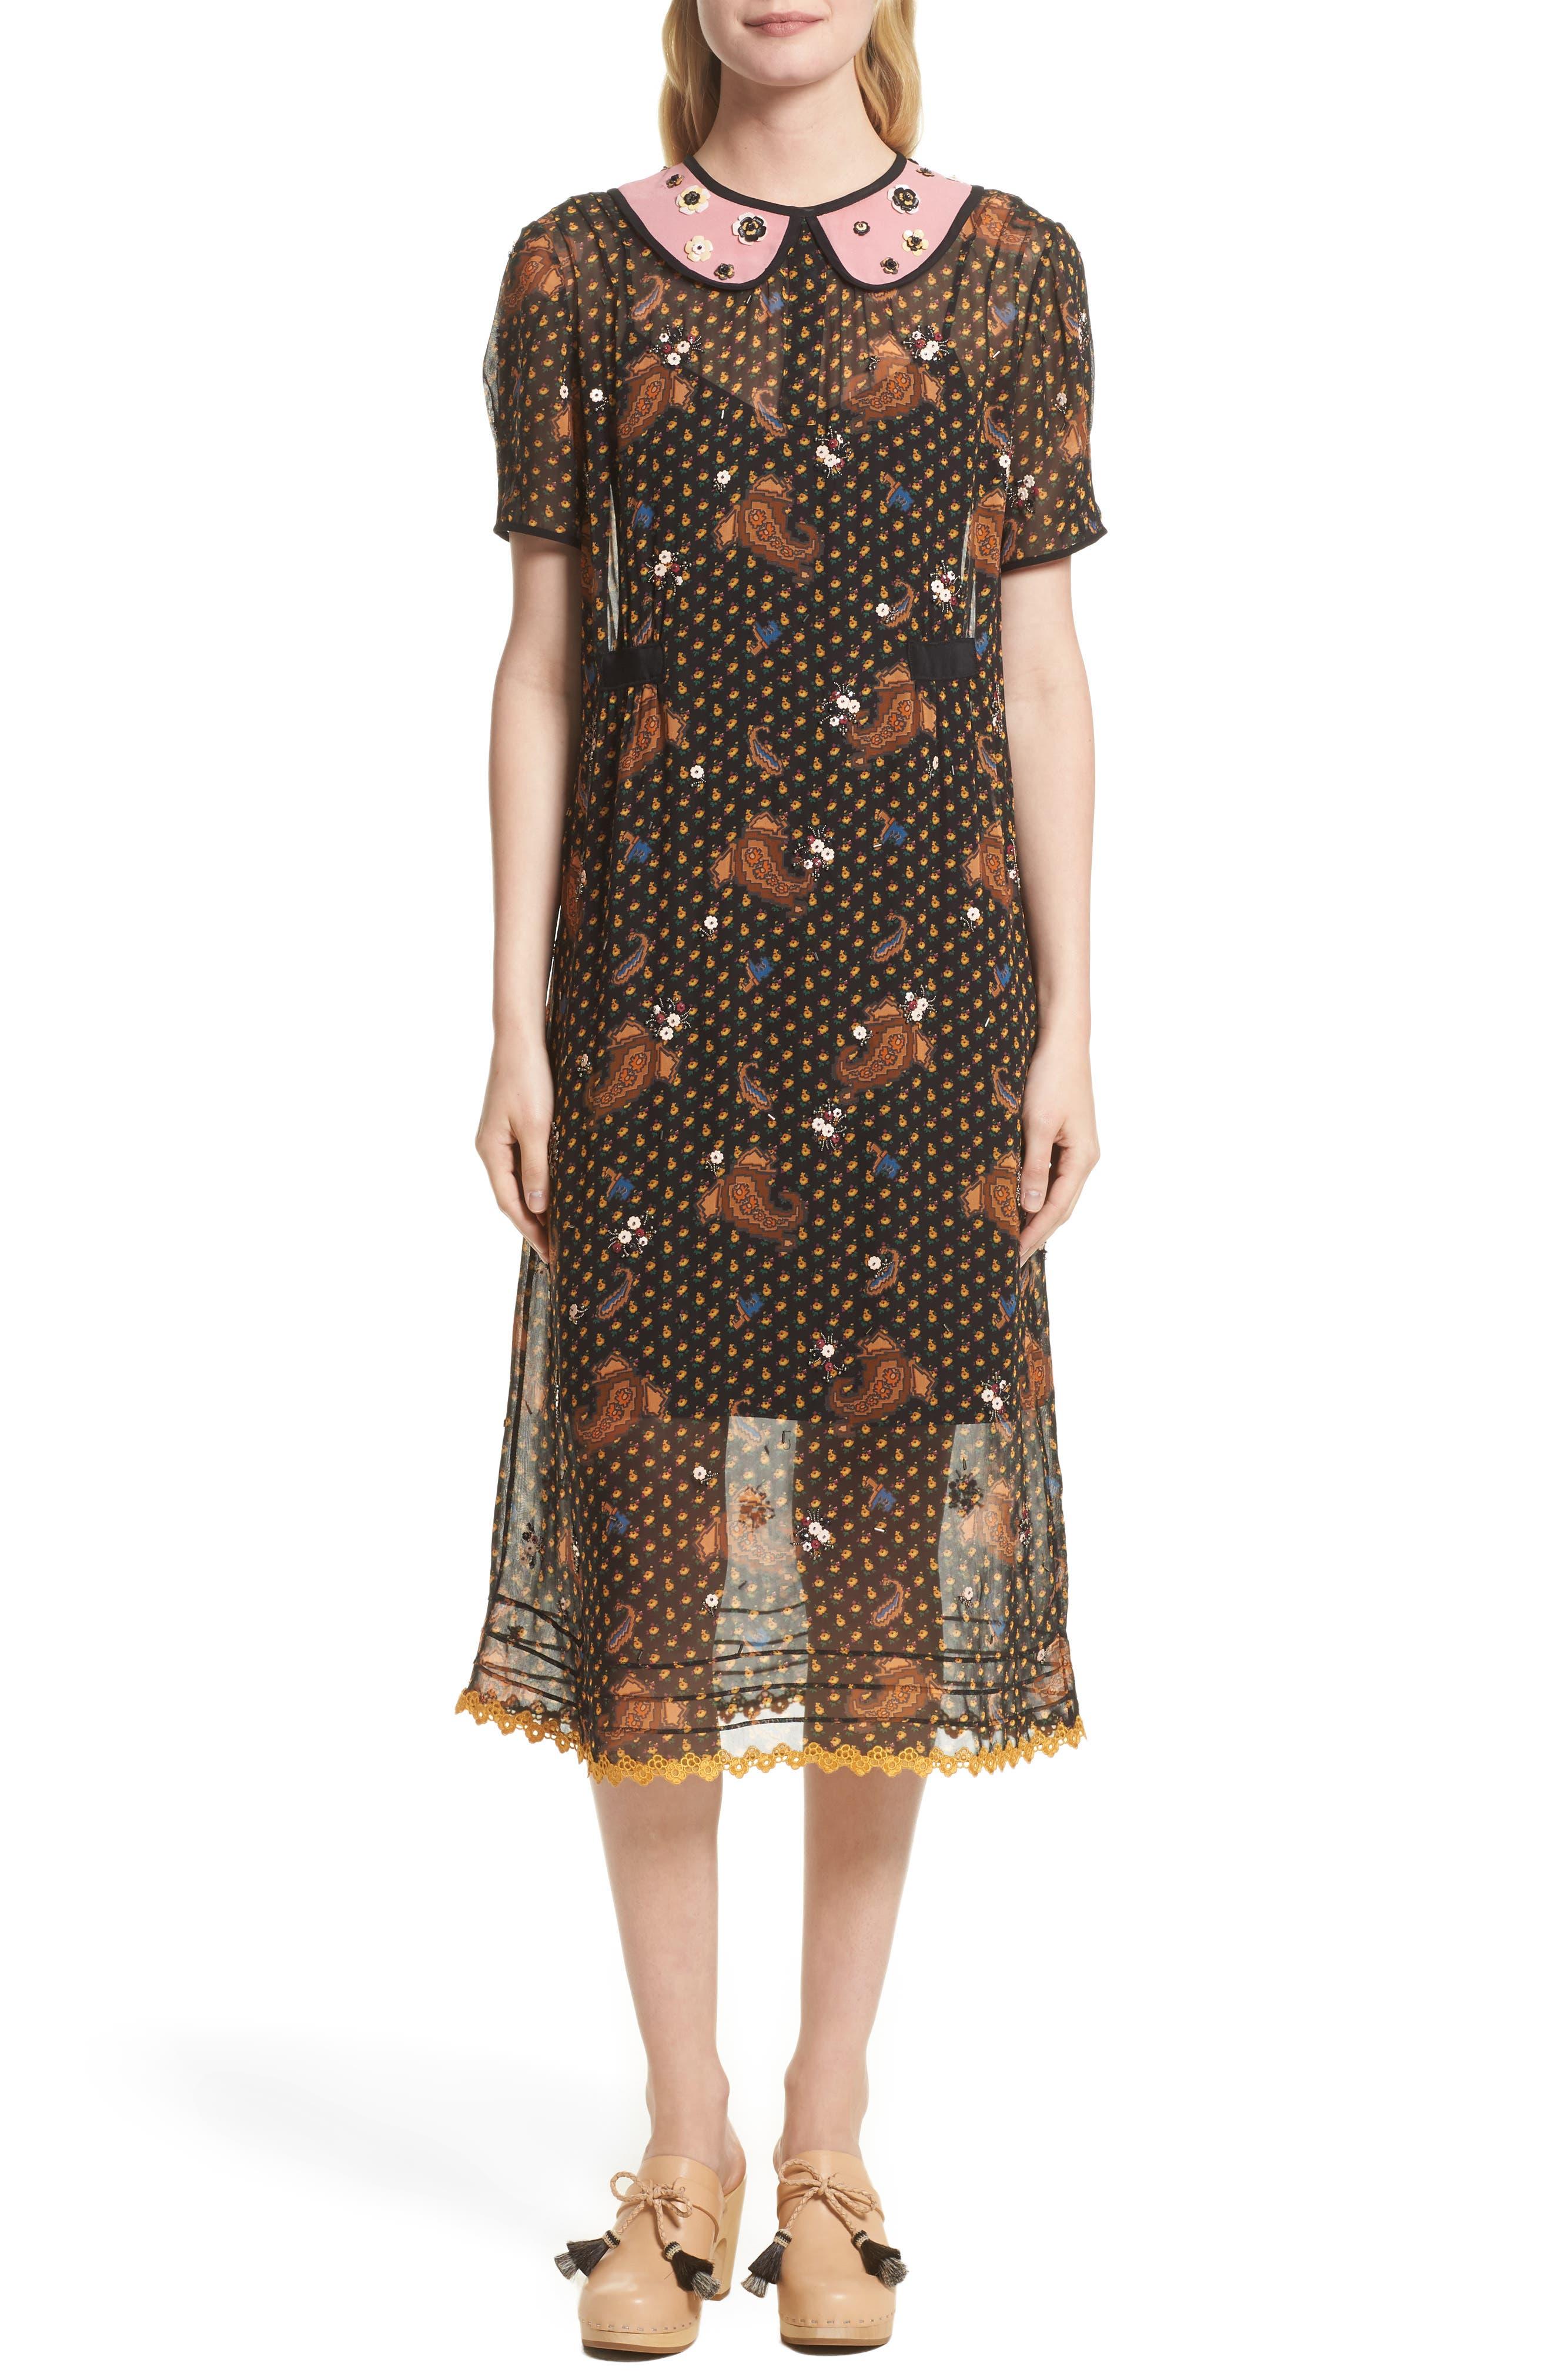 COACH 1941 Embellished Midi Dress